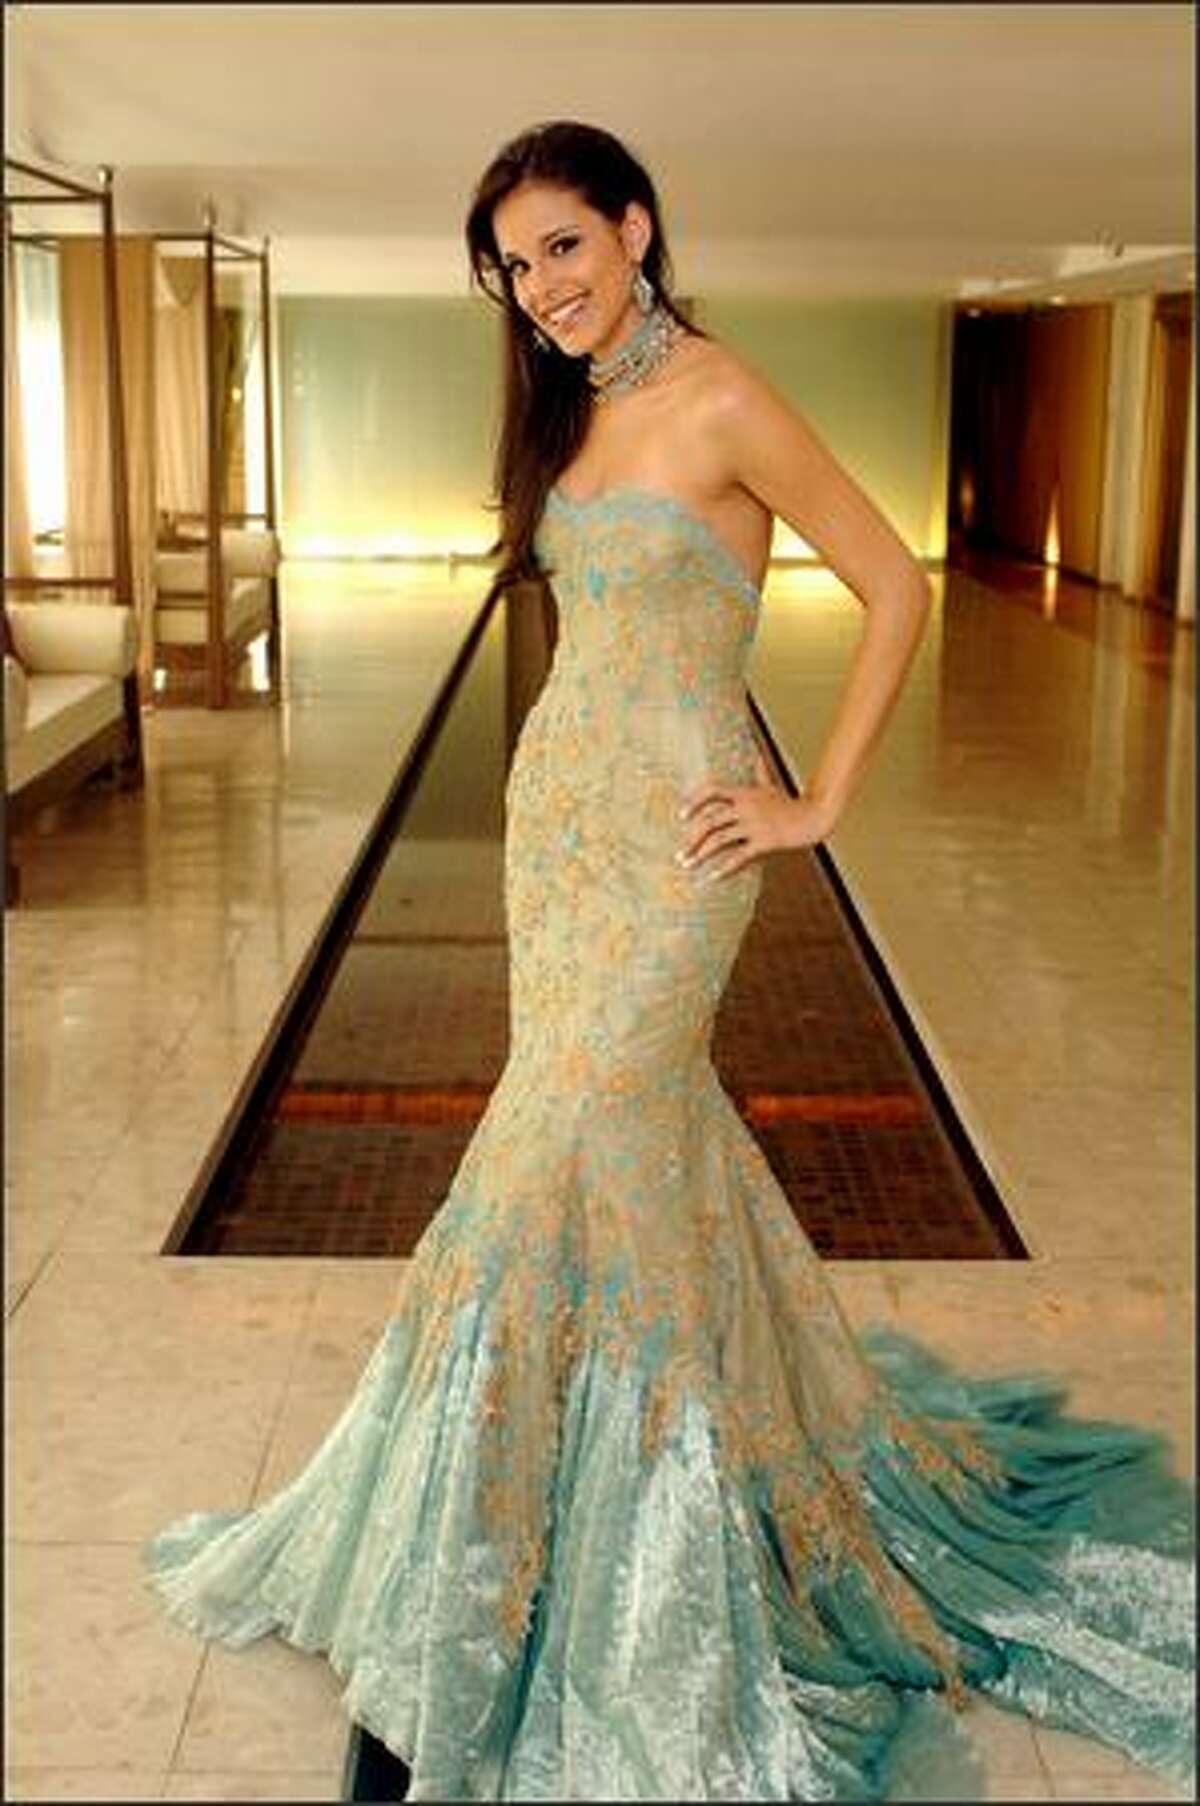 Renata Soñé, Miss Dominican Republic.